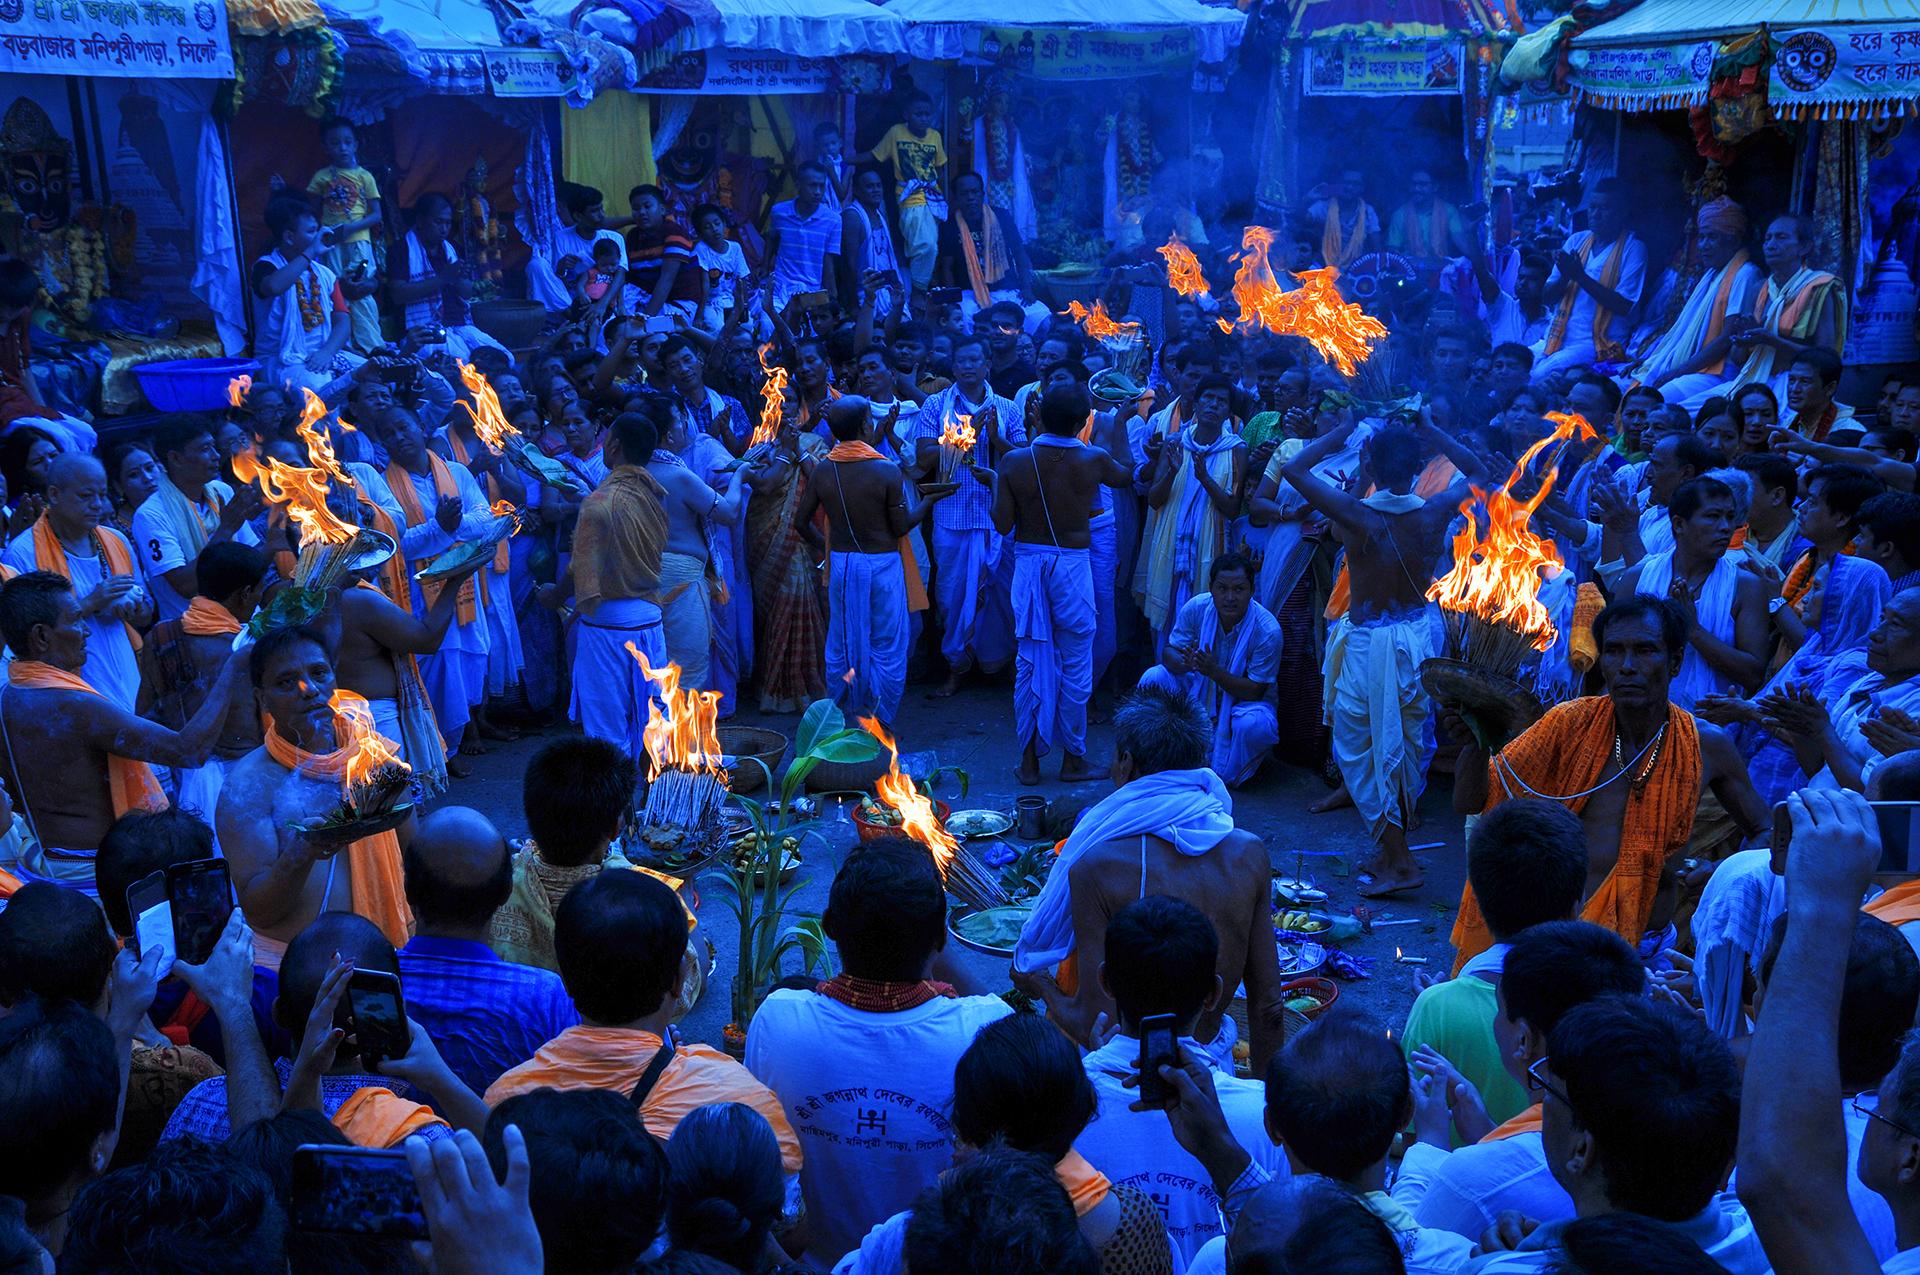 Tradiitional Religious Ratha Yatra Festival, Bangladesh